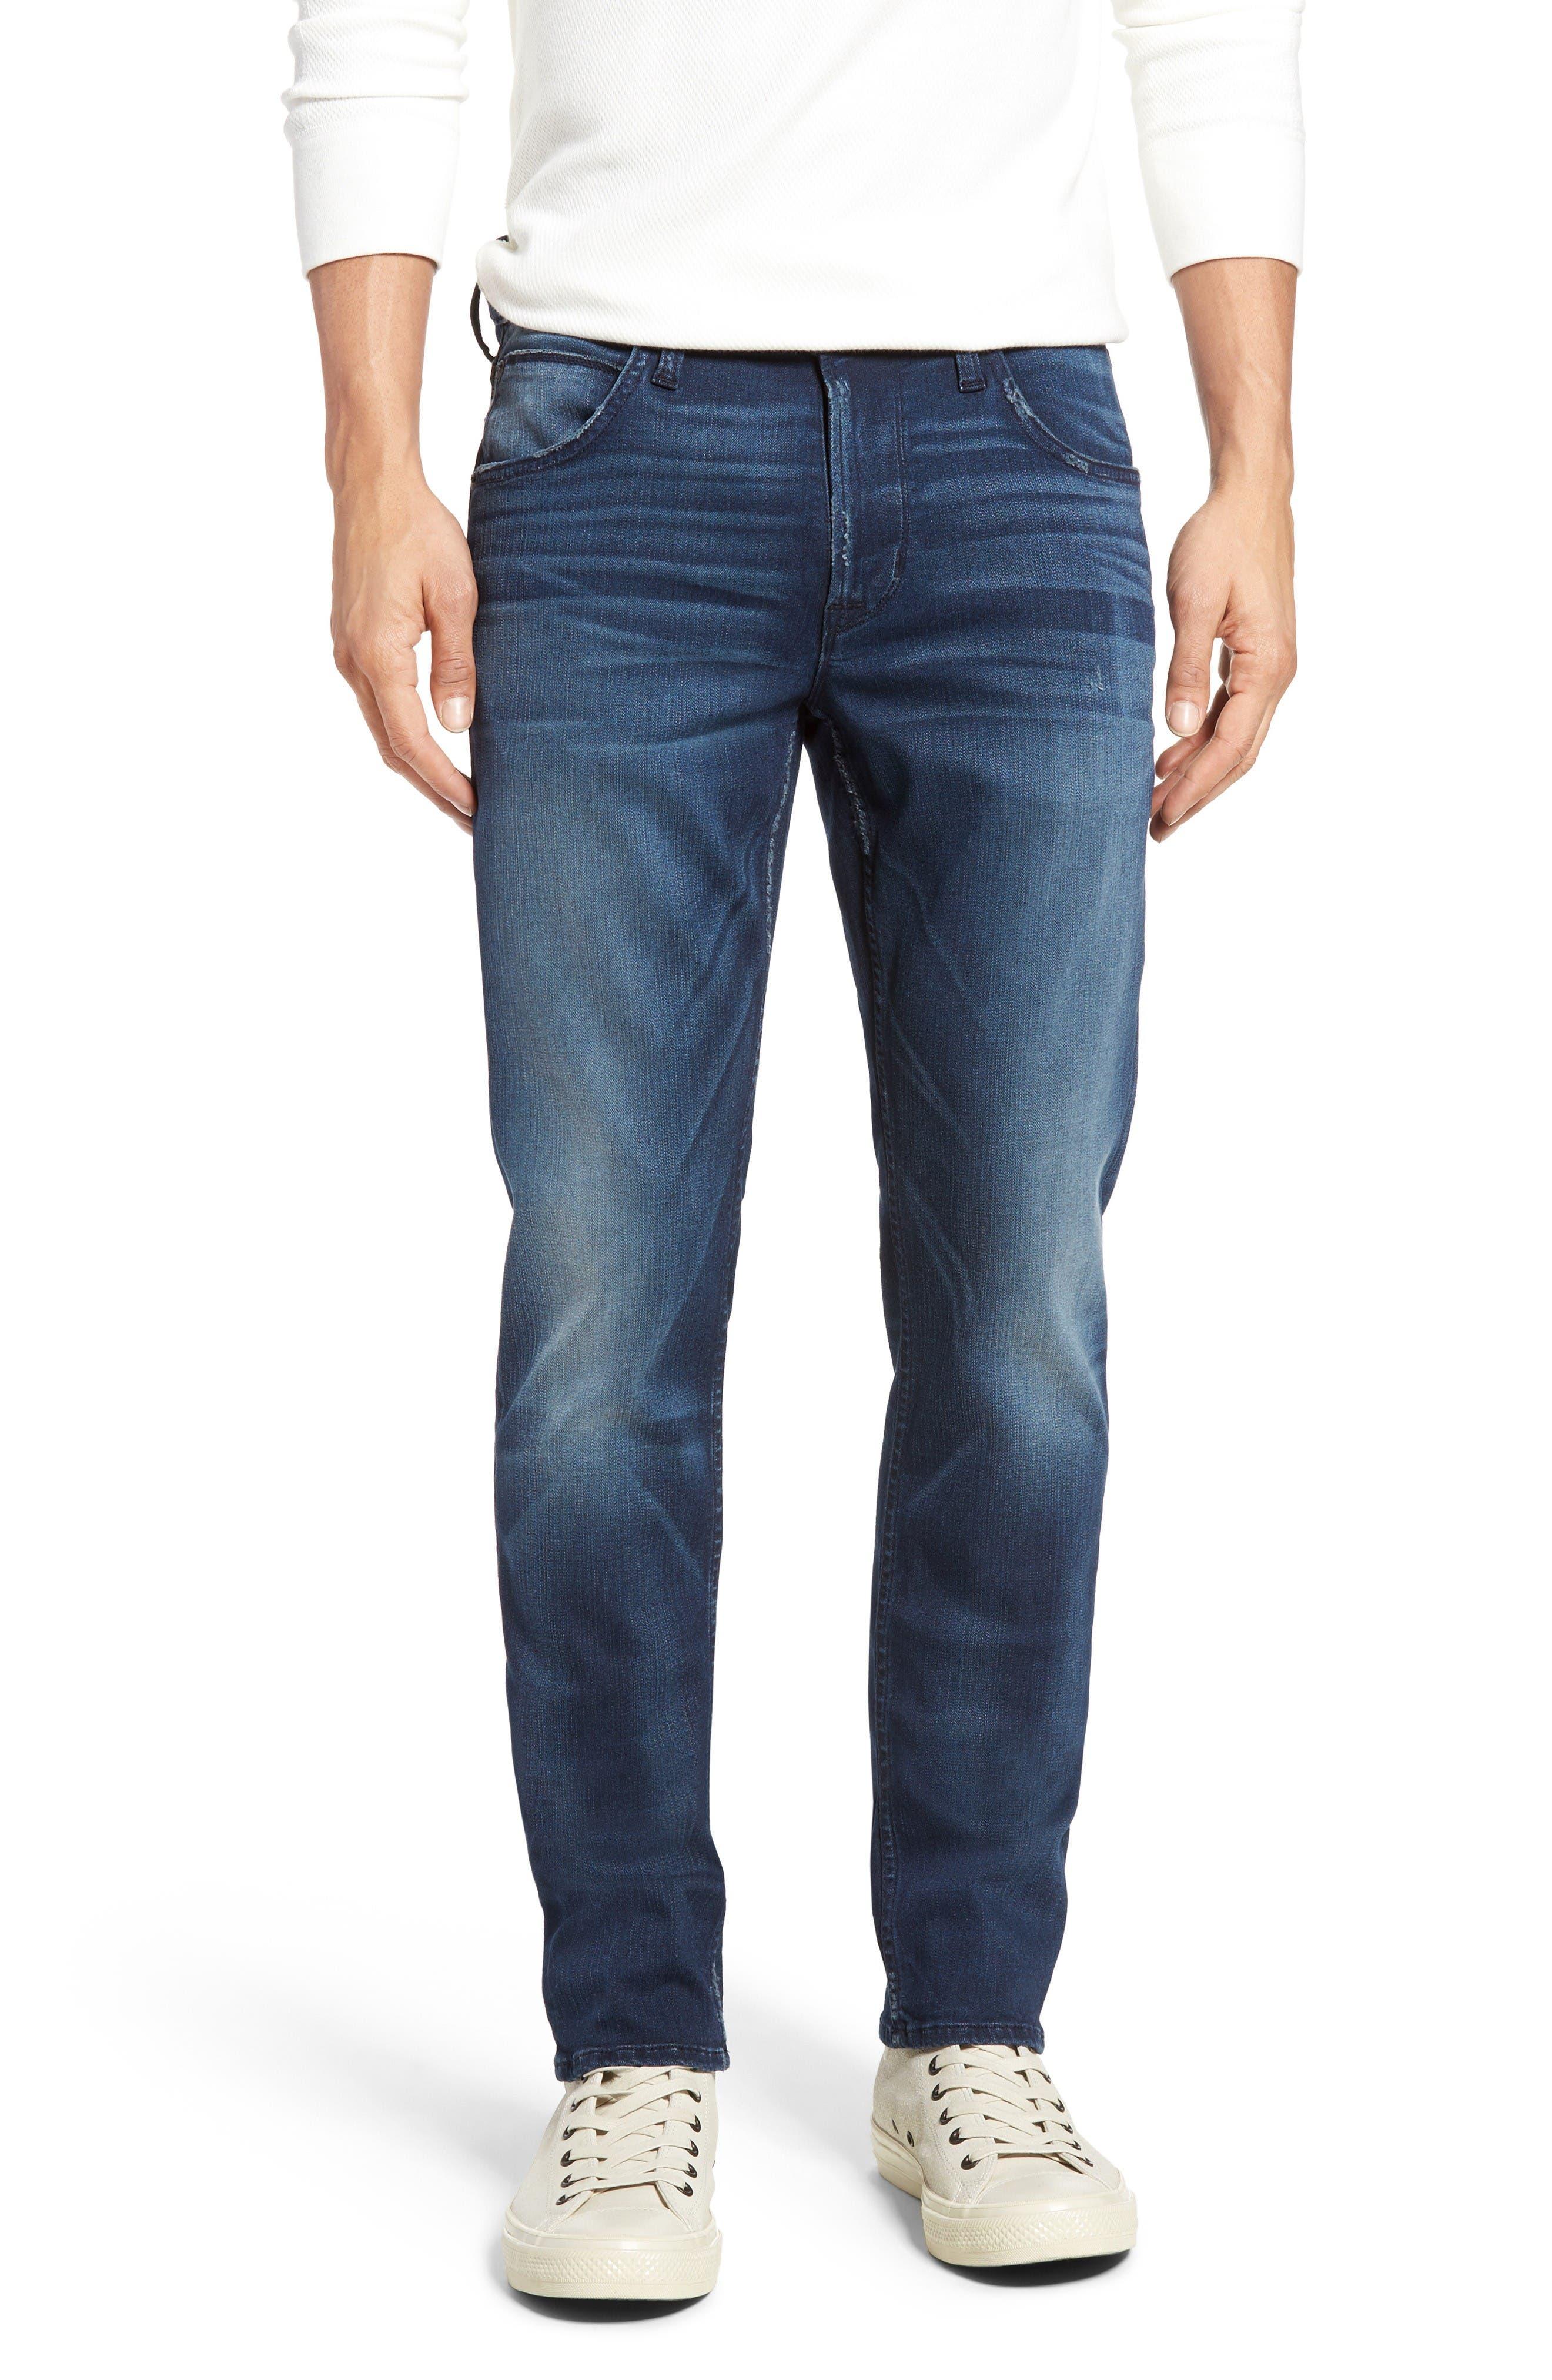 Blake Slim Fit Jeans,                         Main,                         color, Napoleon Blue